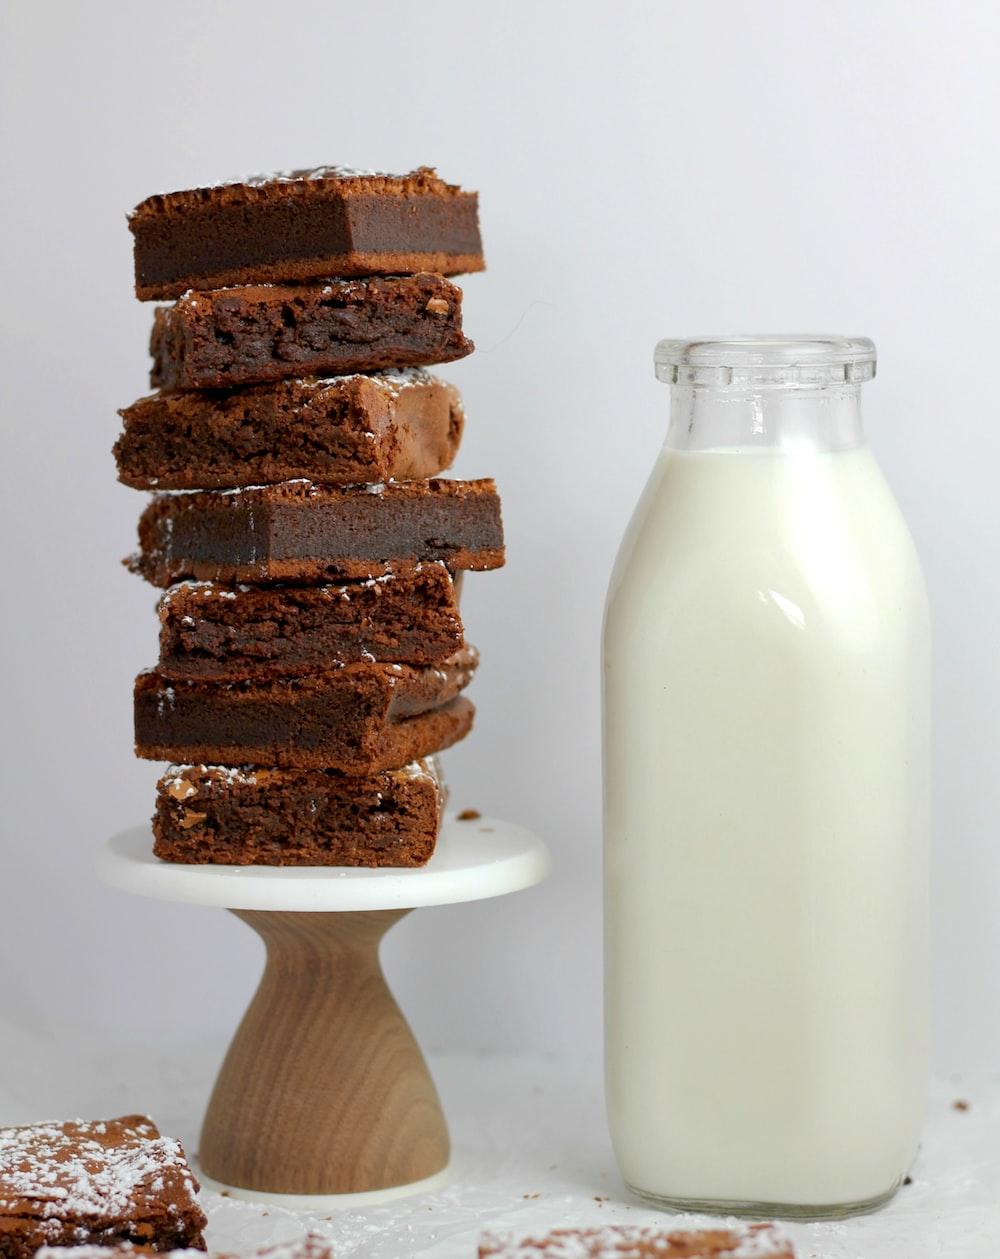 chocolate fudge beside milk bottle